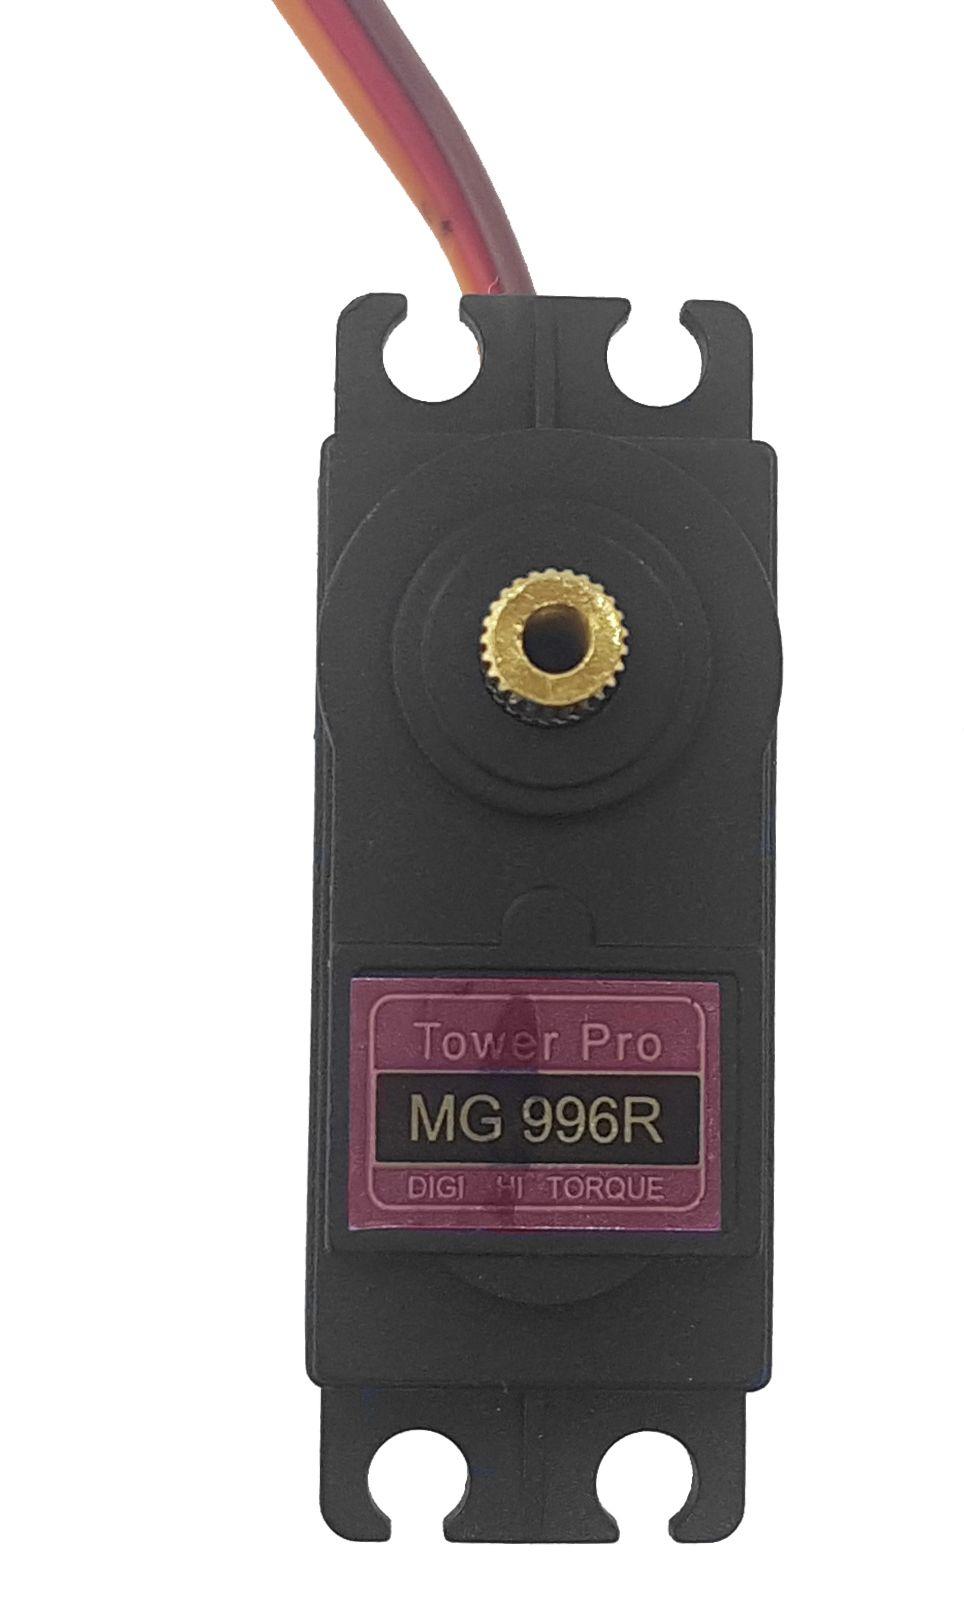 Micro Servo MG996R TowerPro